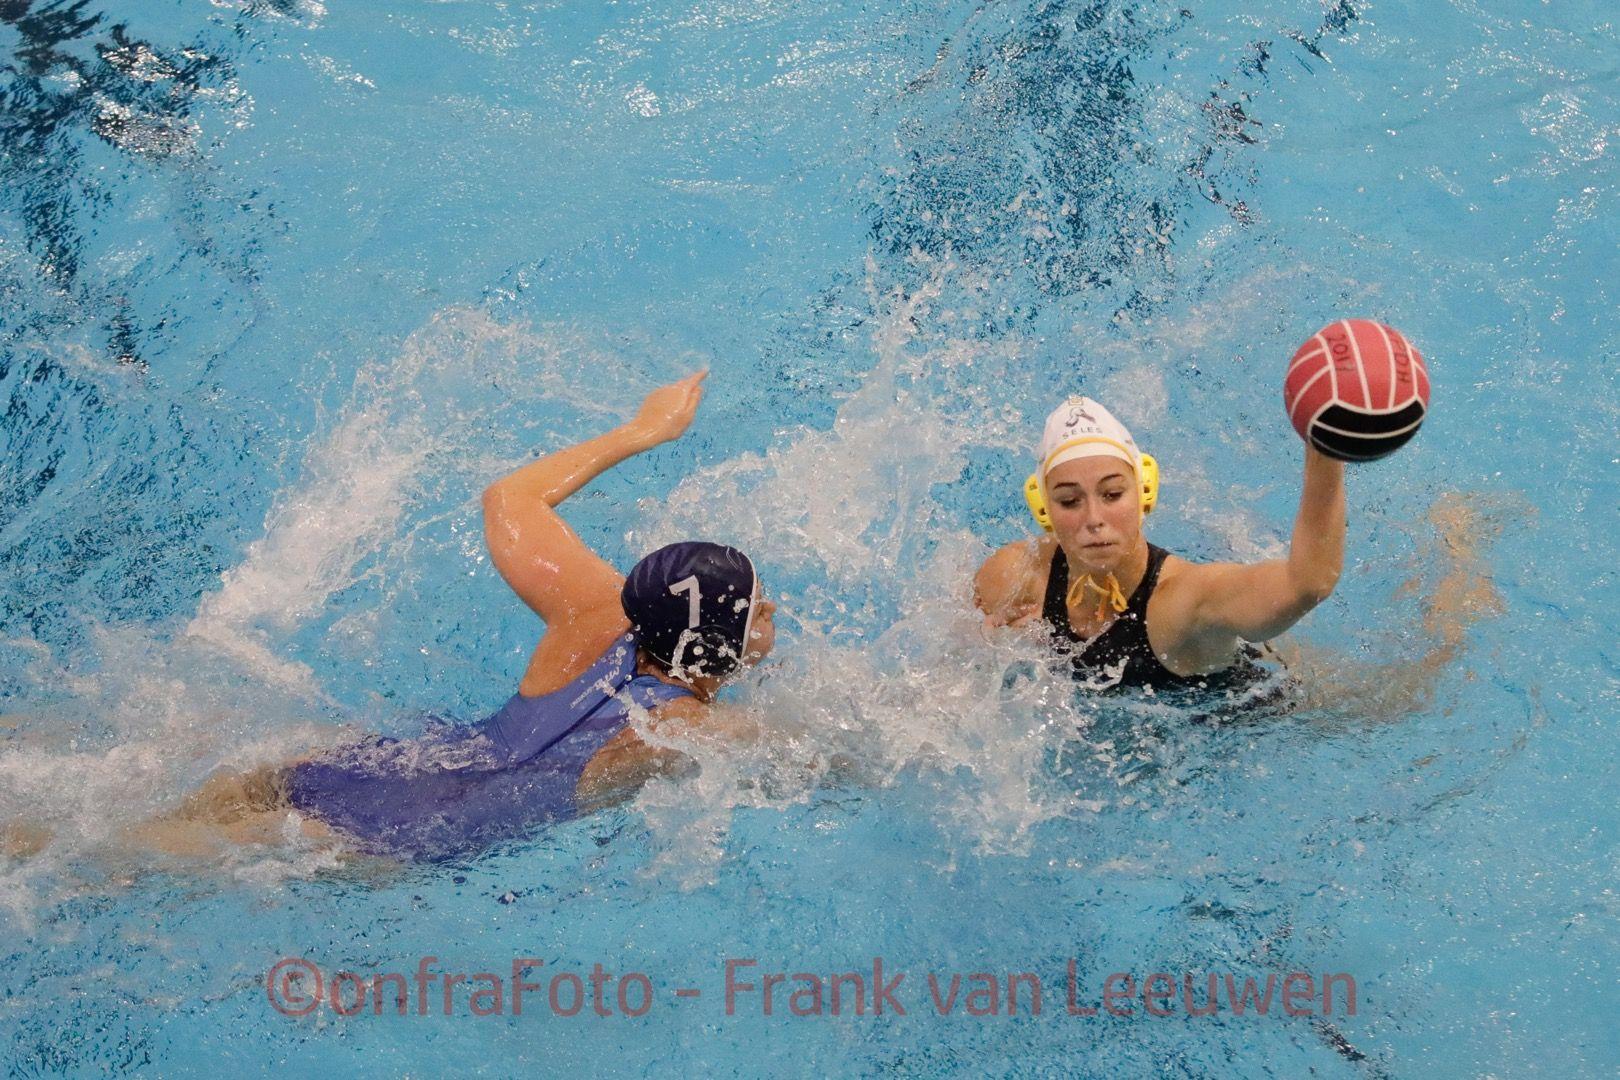 20171104 Waterpolo Den Haag - ZV Haerlem dames FvL15-web